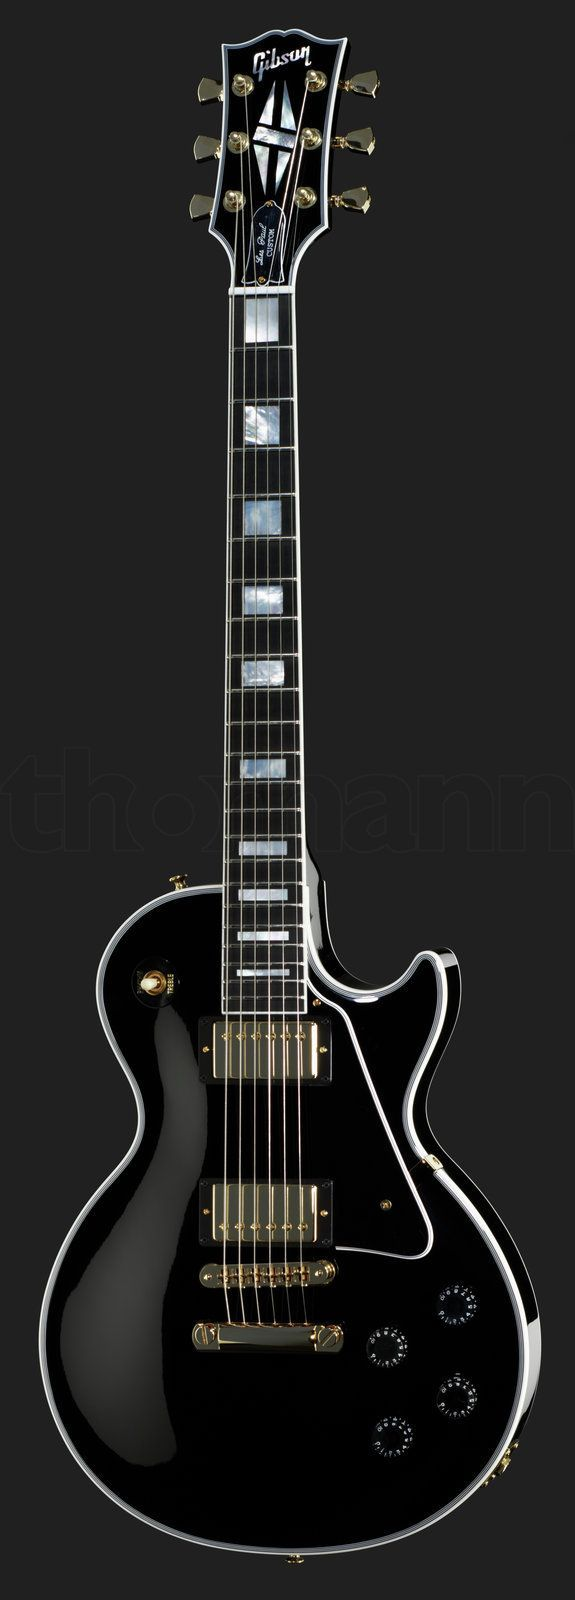 Gibson Les Paul Custom Eb Gh Wallpapers Pinterest Guitares